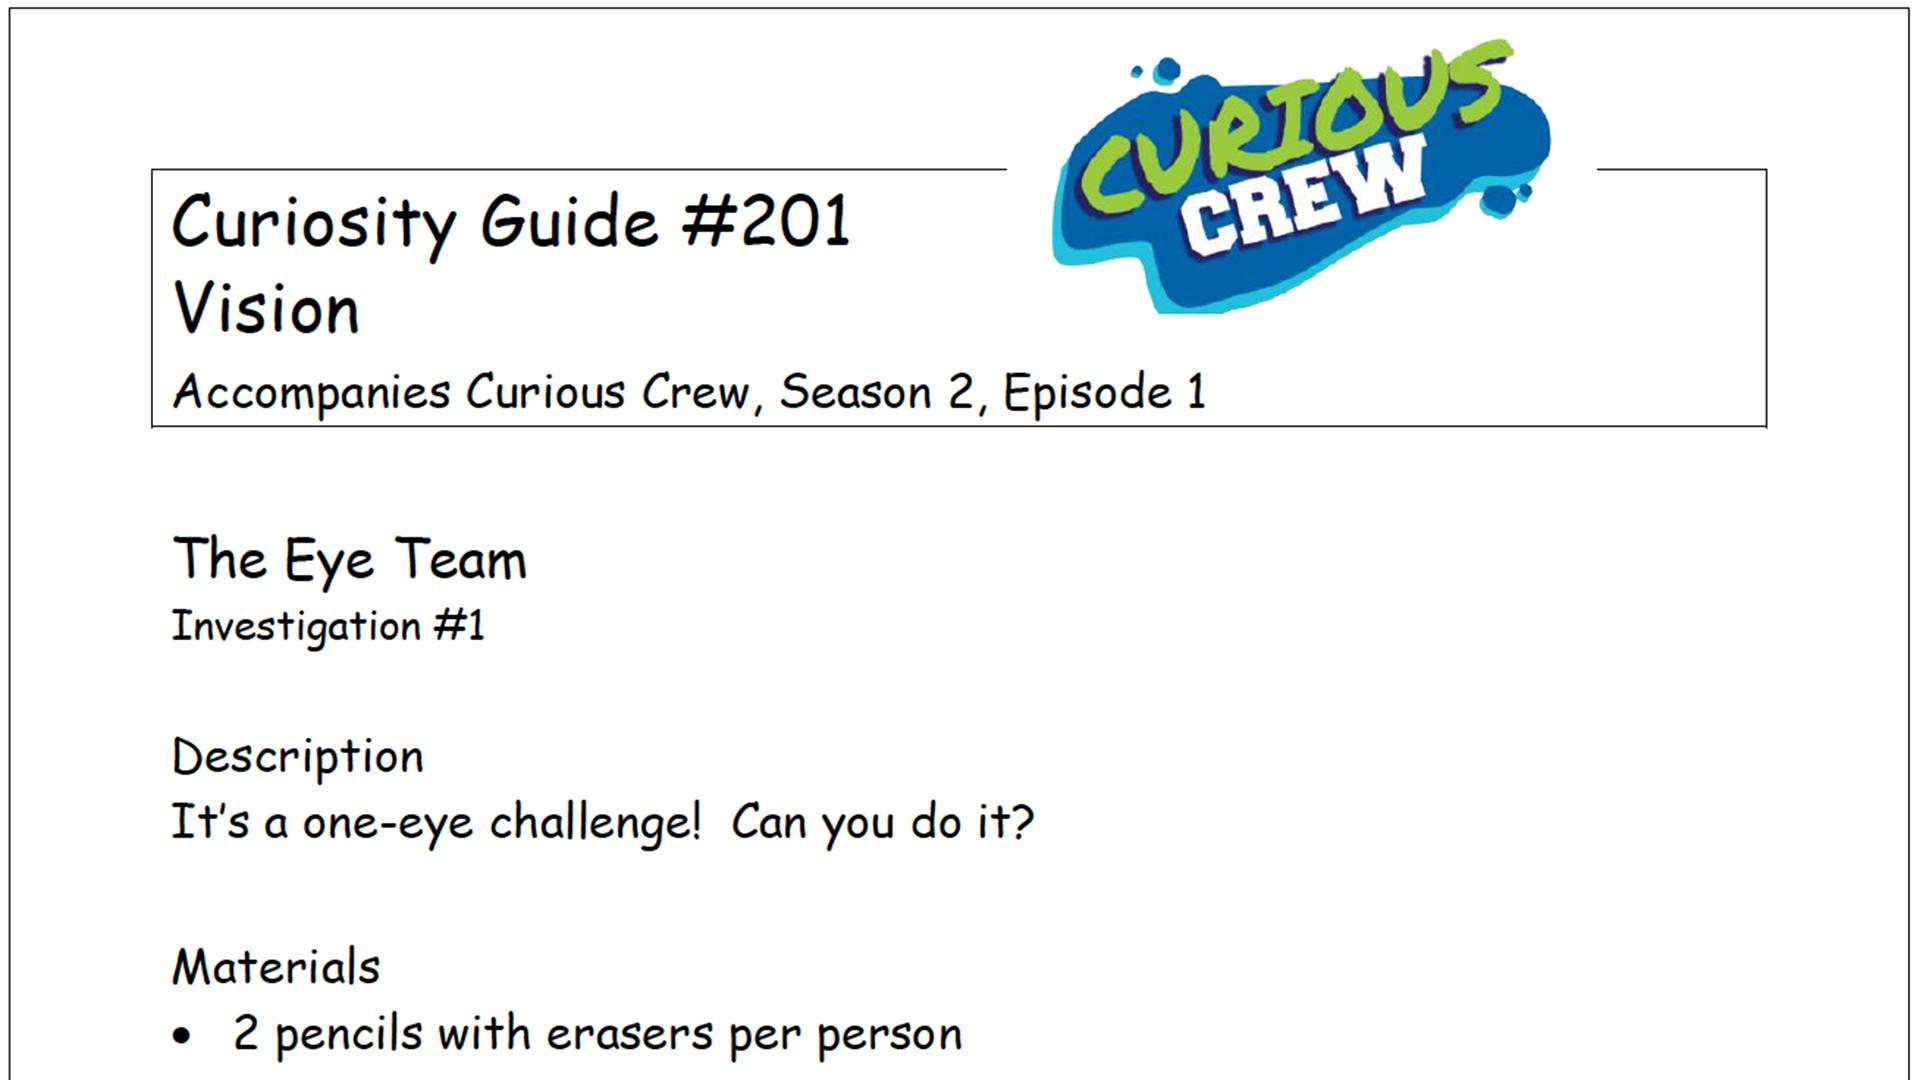 Curiosity Guide 201